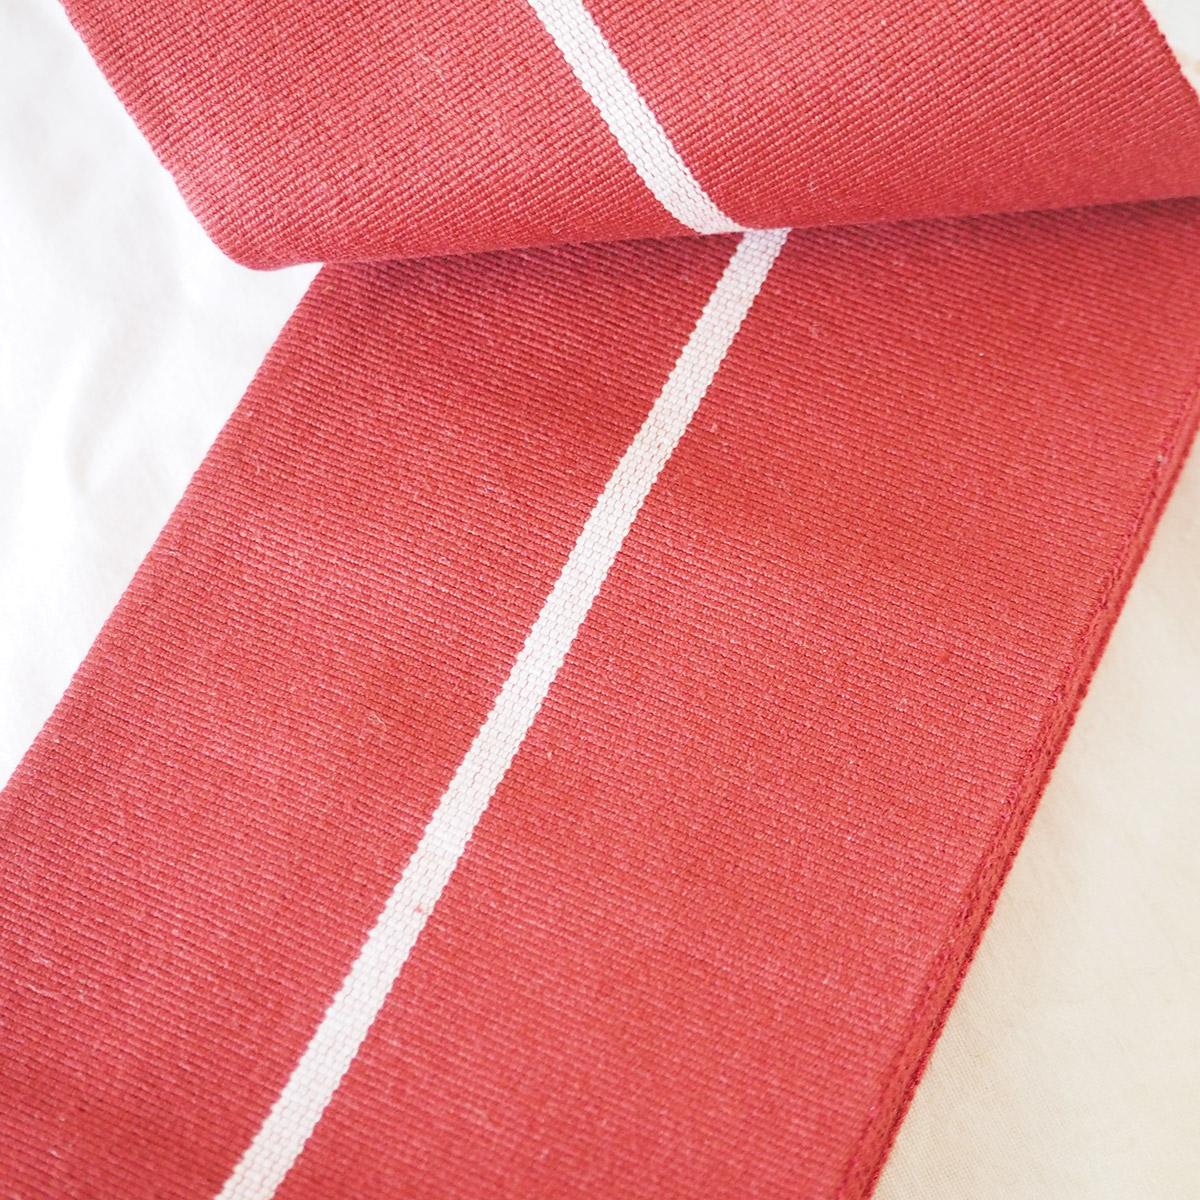 献上柄角帯(クリーム色、若草色、赤色)